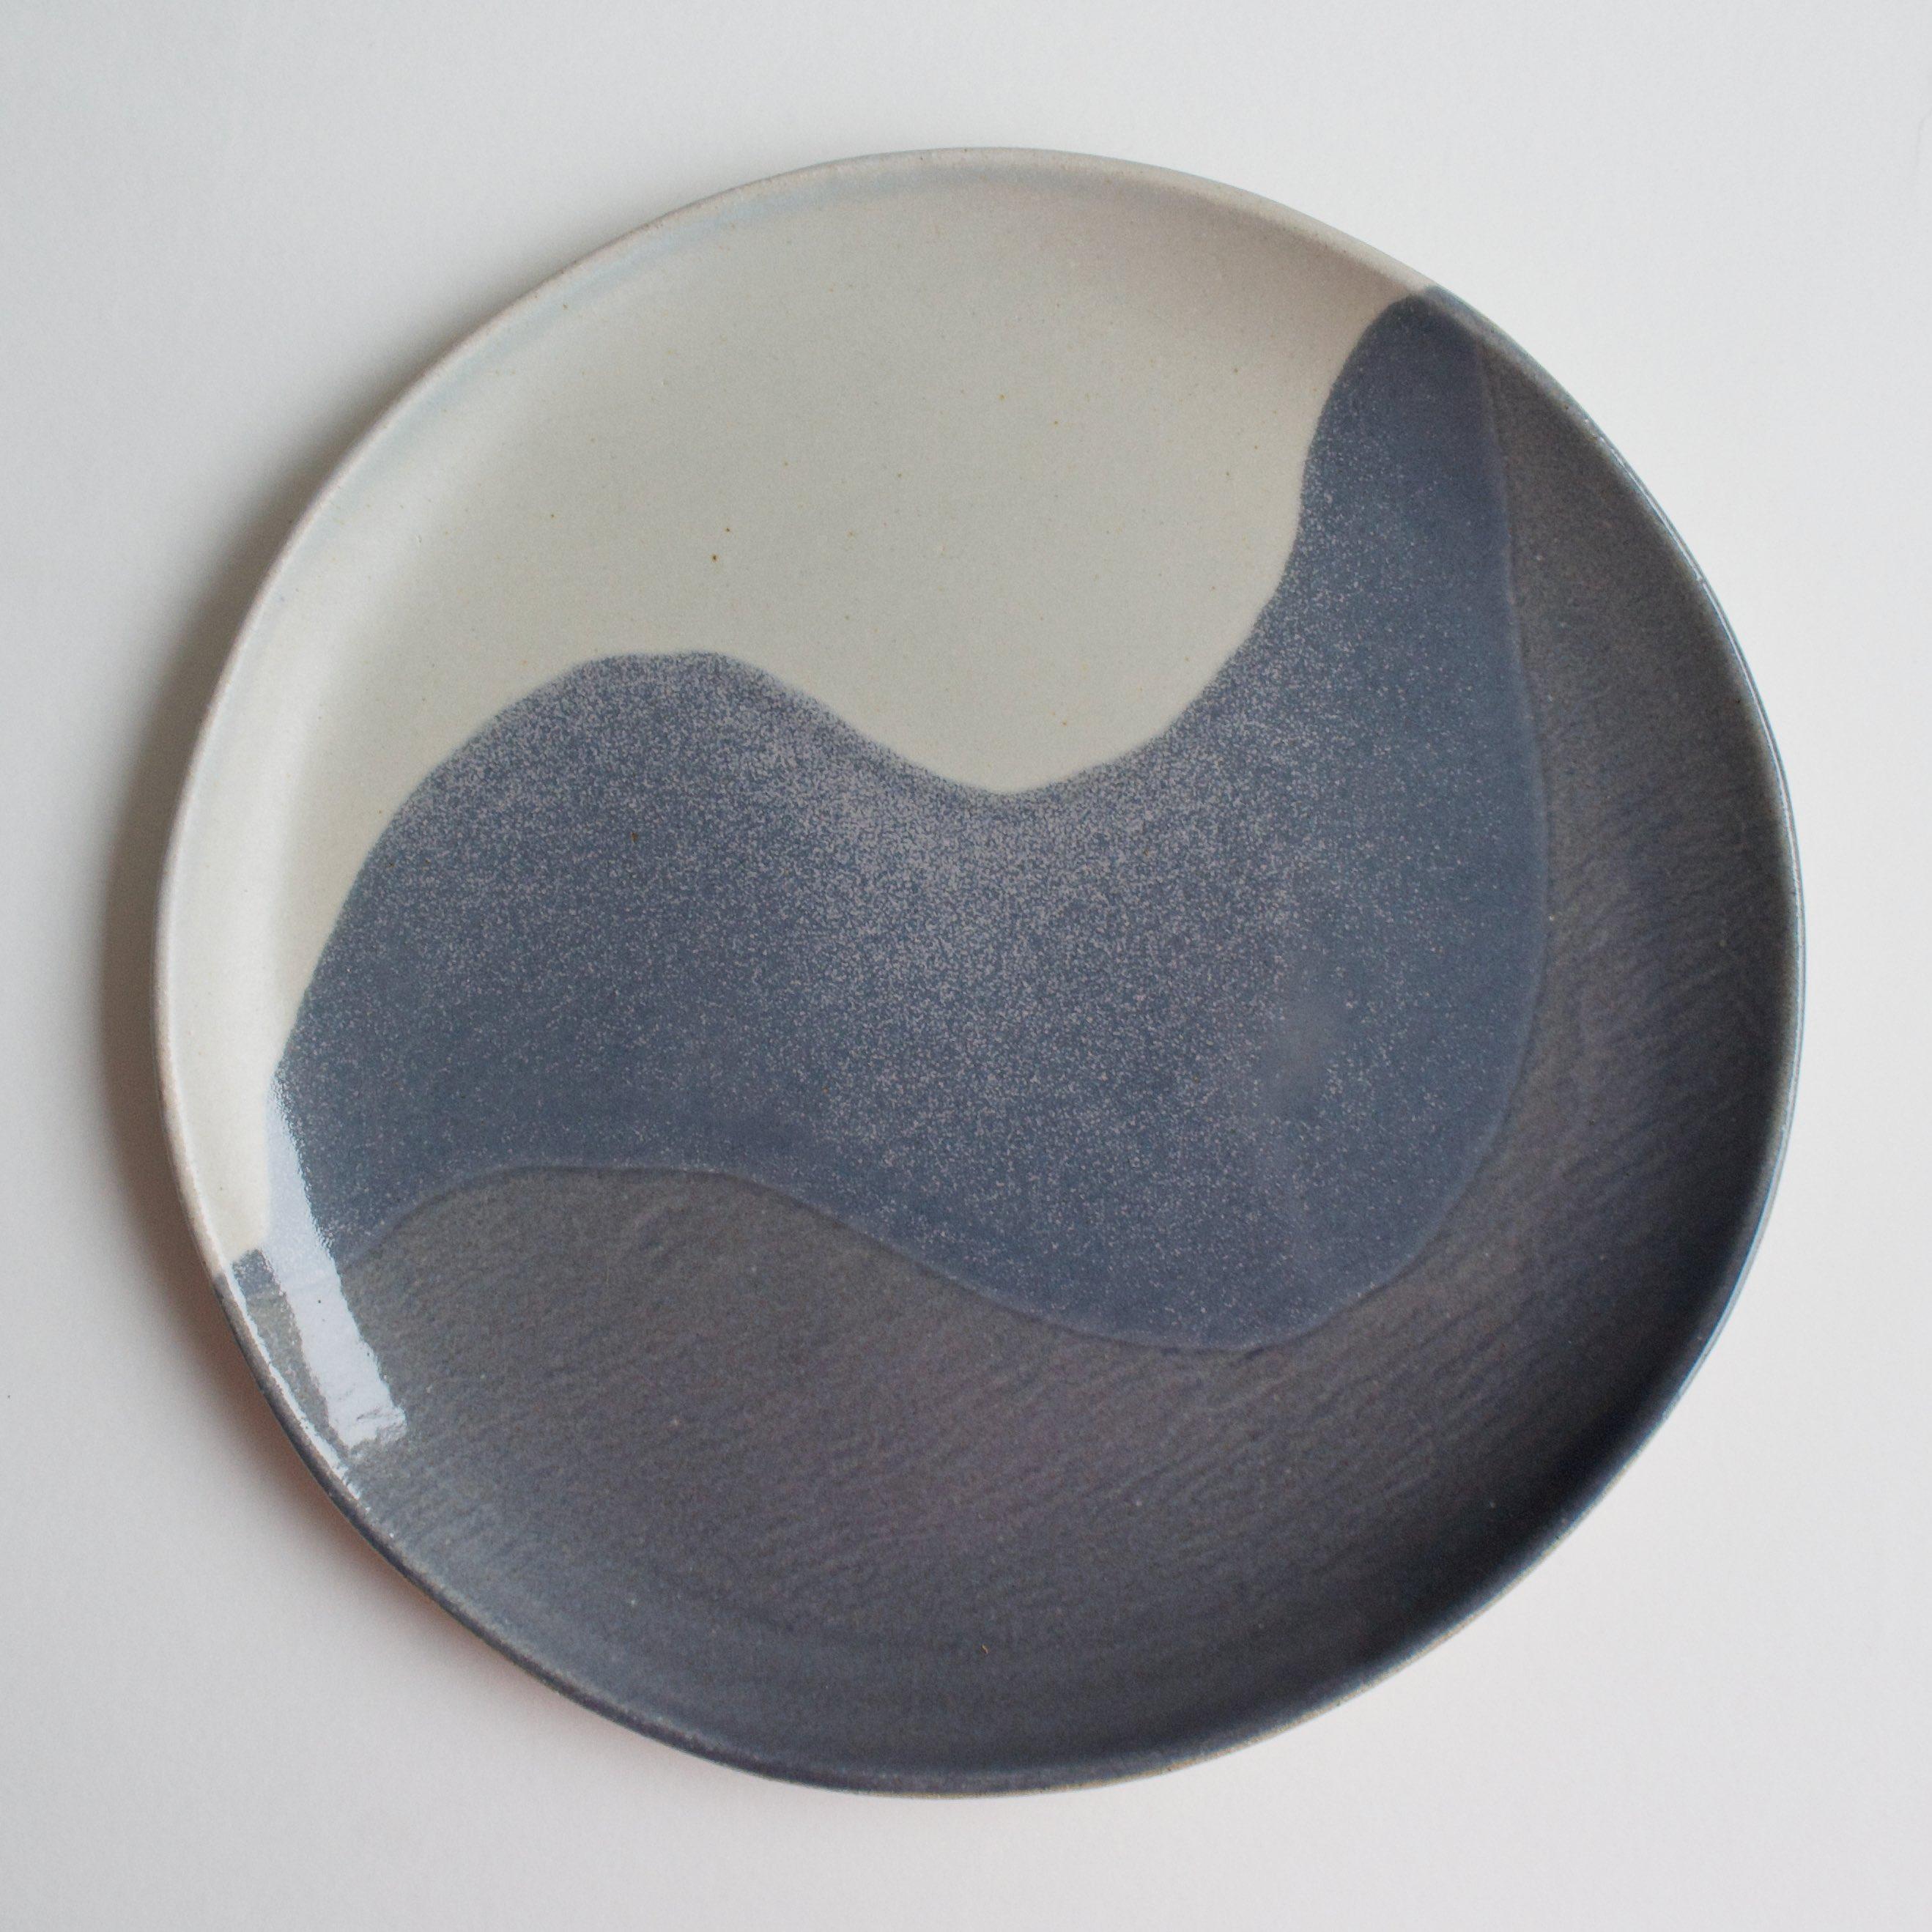 Glacier dinner plate in grey blue